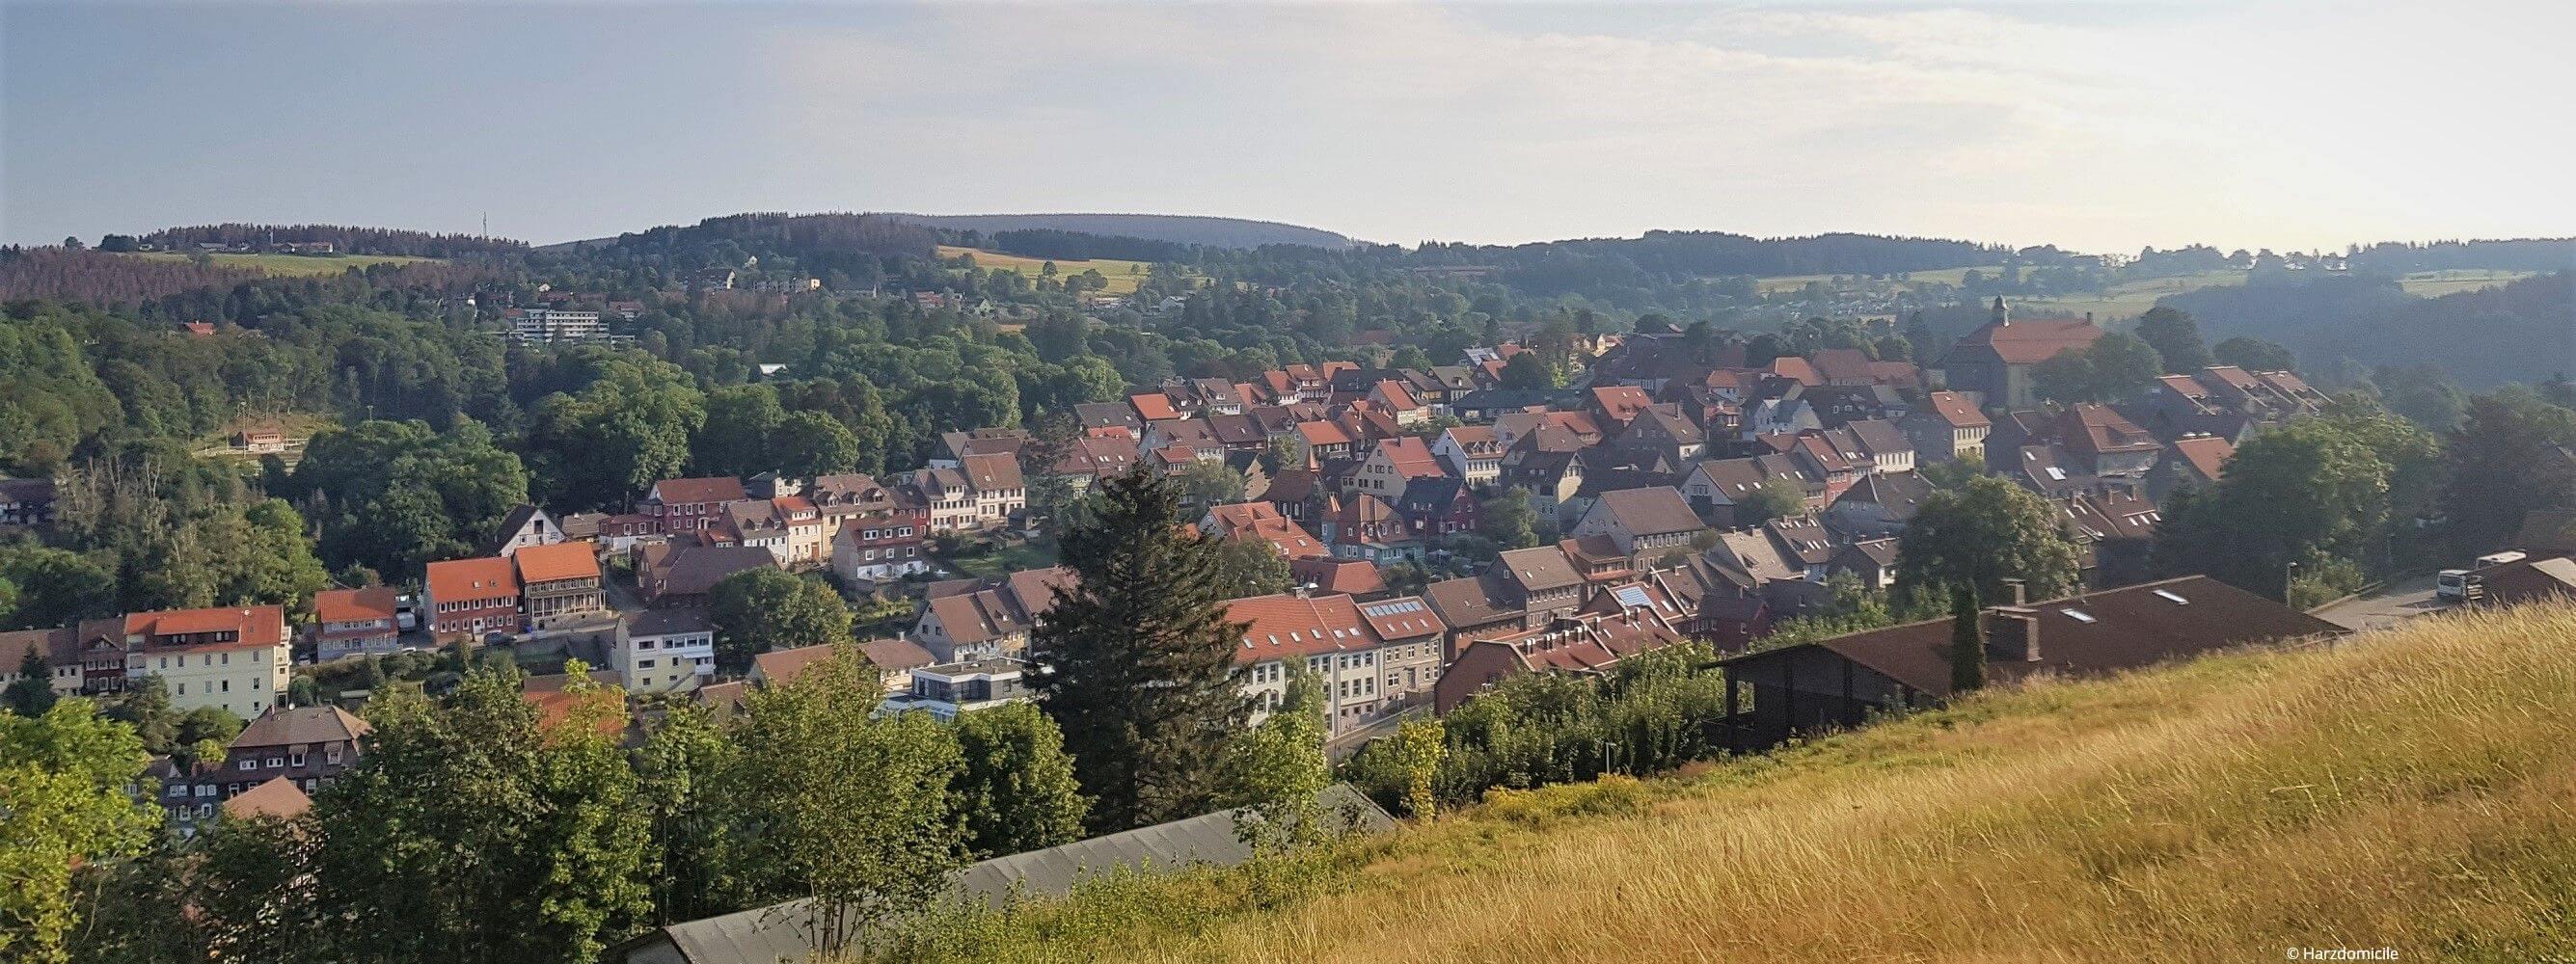 Ausblick vom Glockenberg in Sankt Andreasberg.